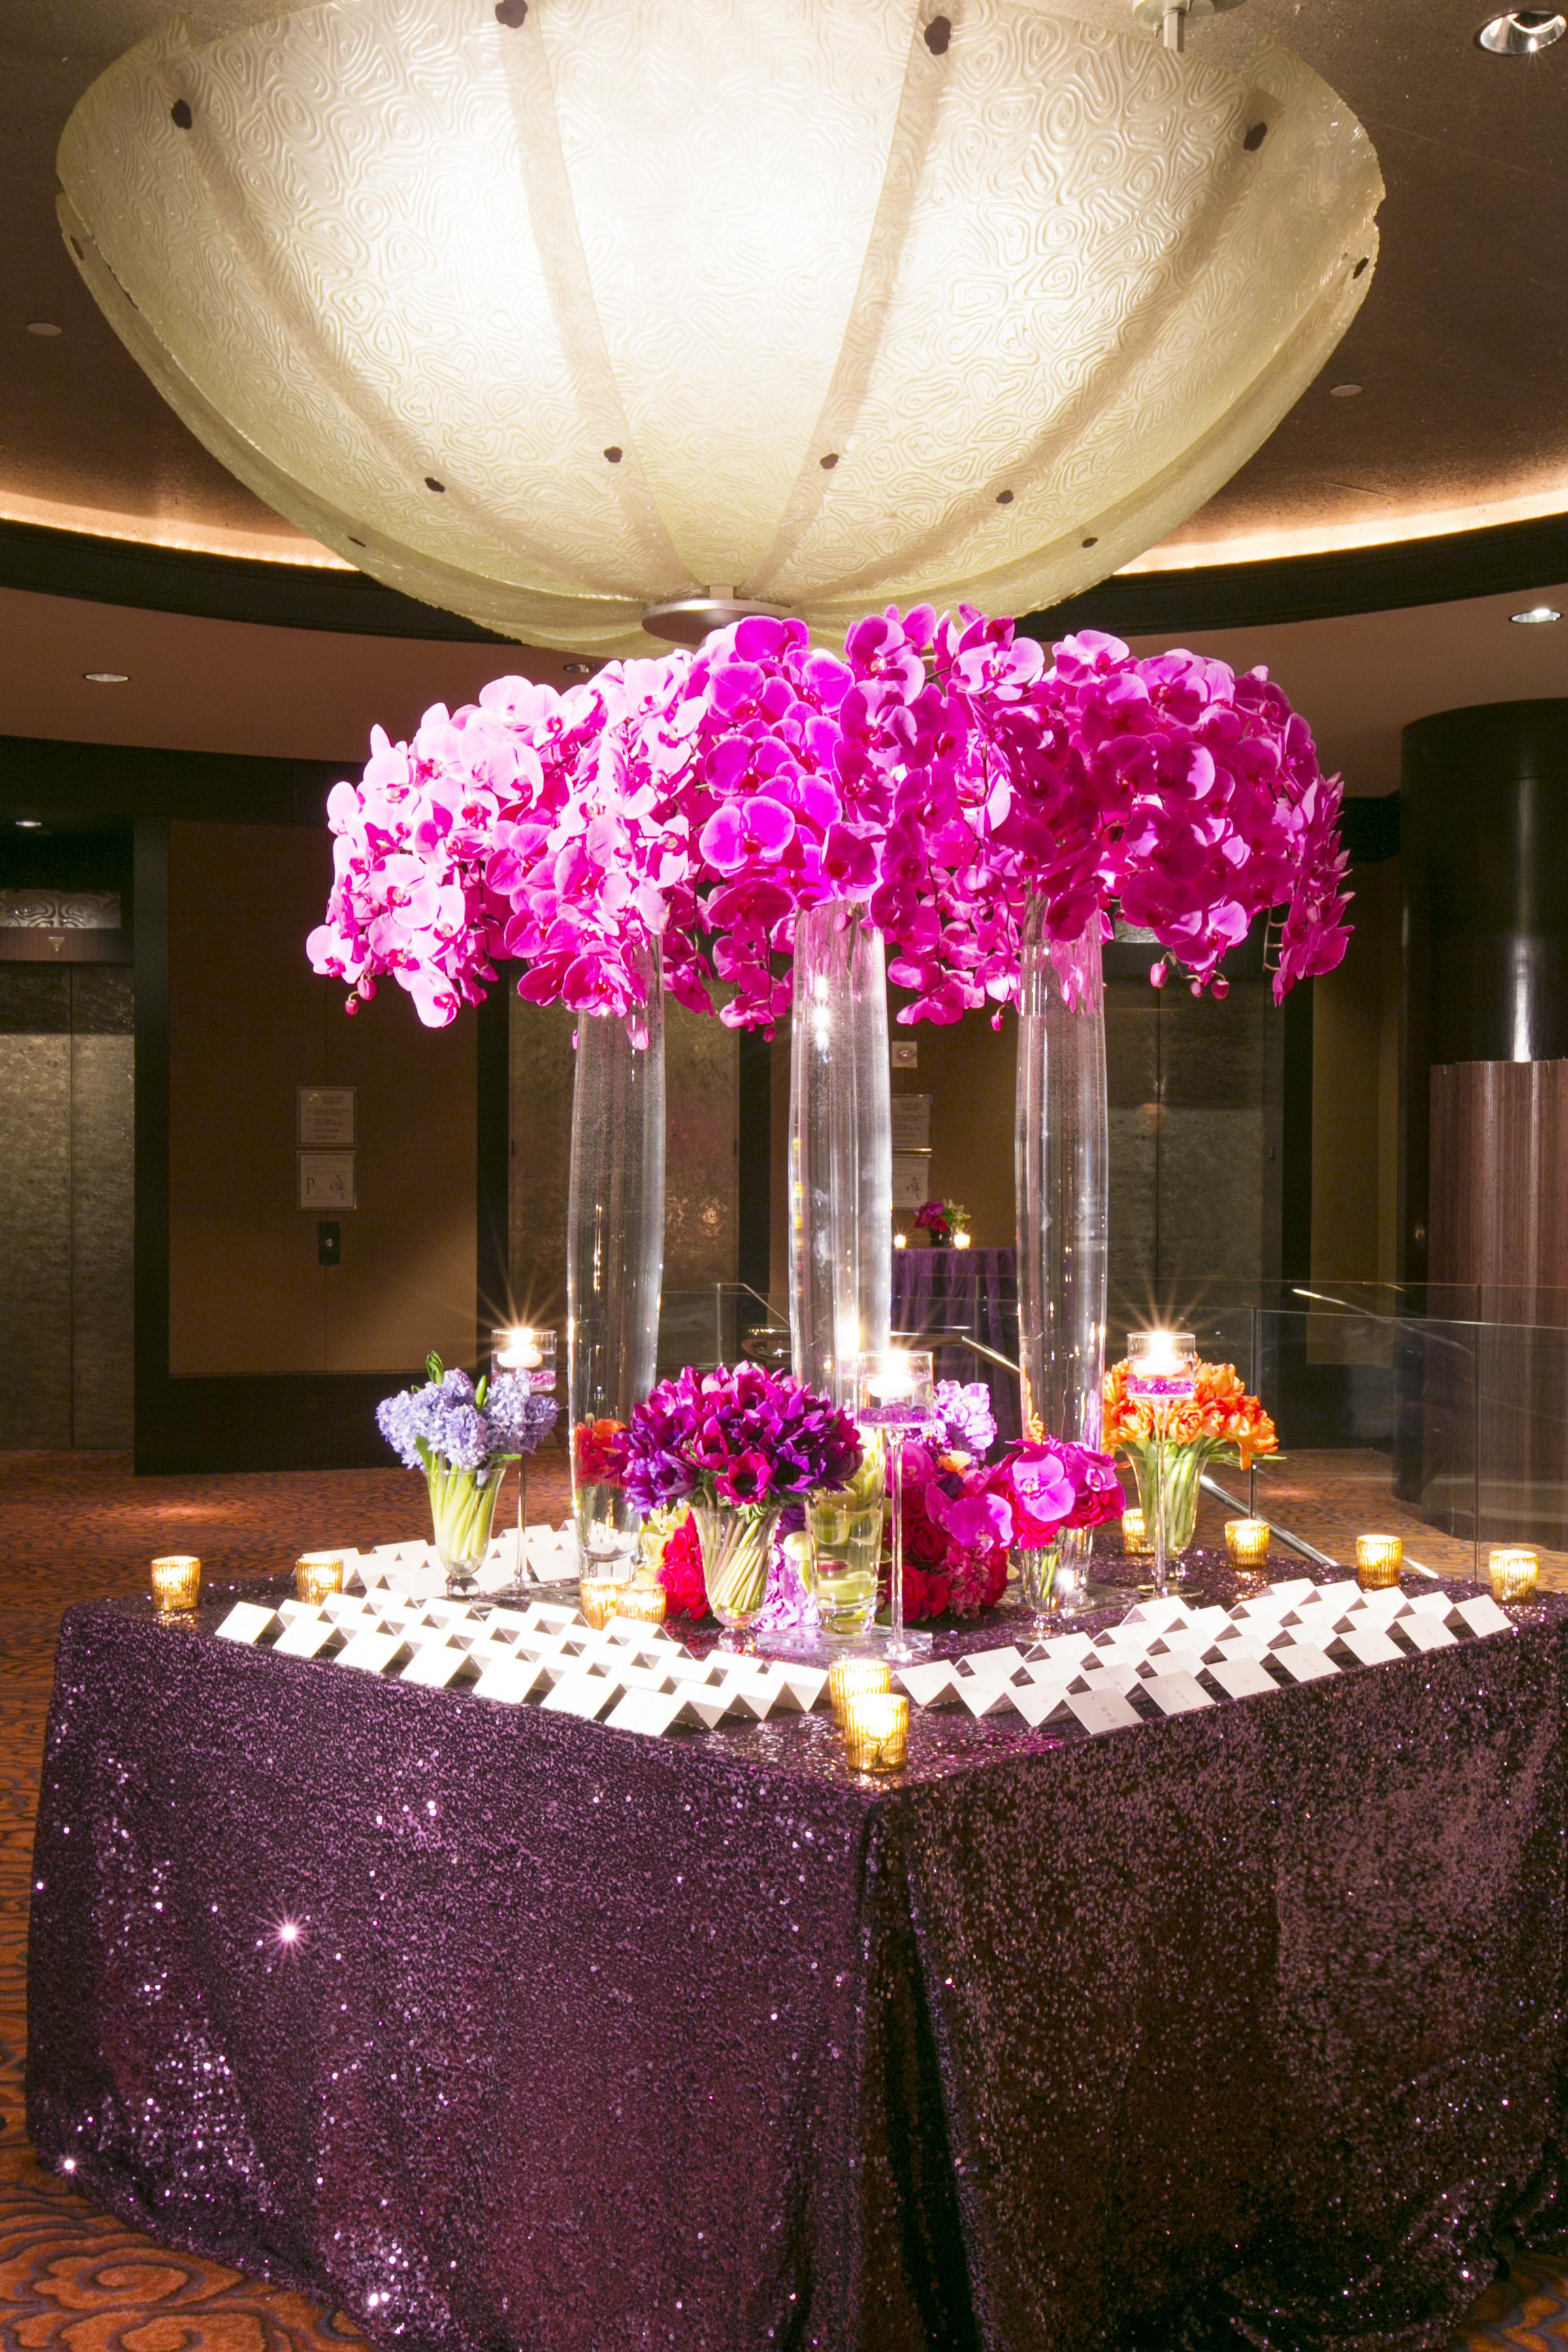 NYC-Wedding-Planner-Andrea-Freeman-Events-Mandarin-Oriental-8.jpg